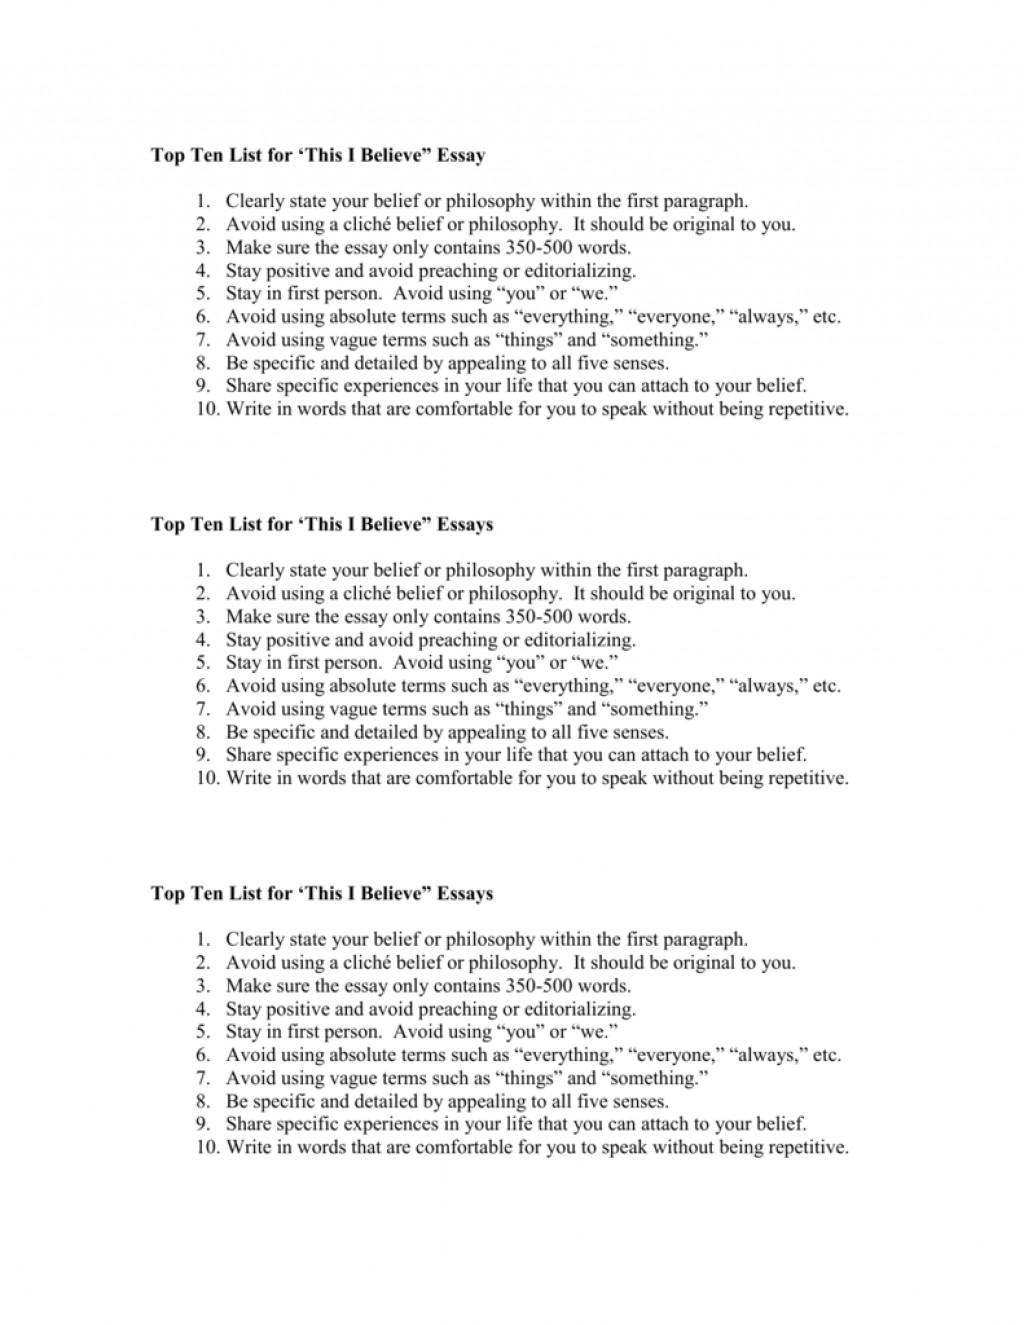 008 I Belive Essays 007293020 1 Essay Surprising Believe About Sports Ideas Large